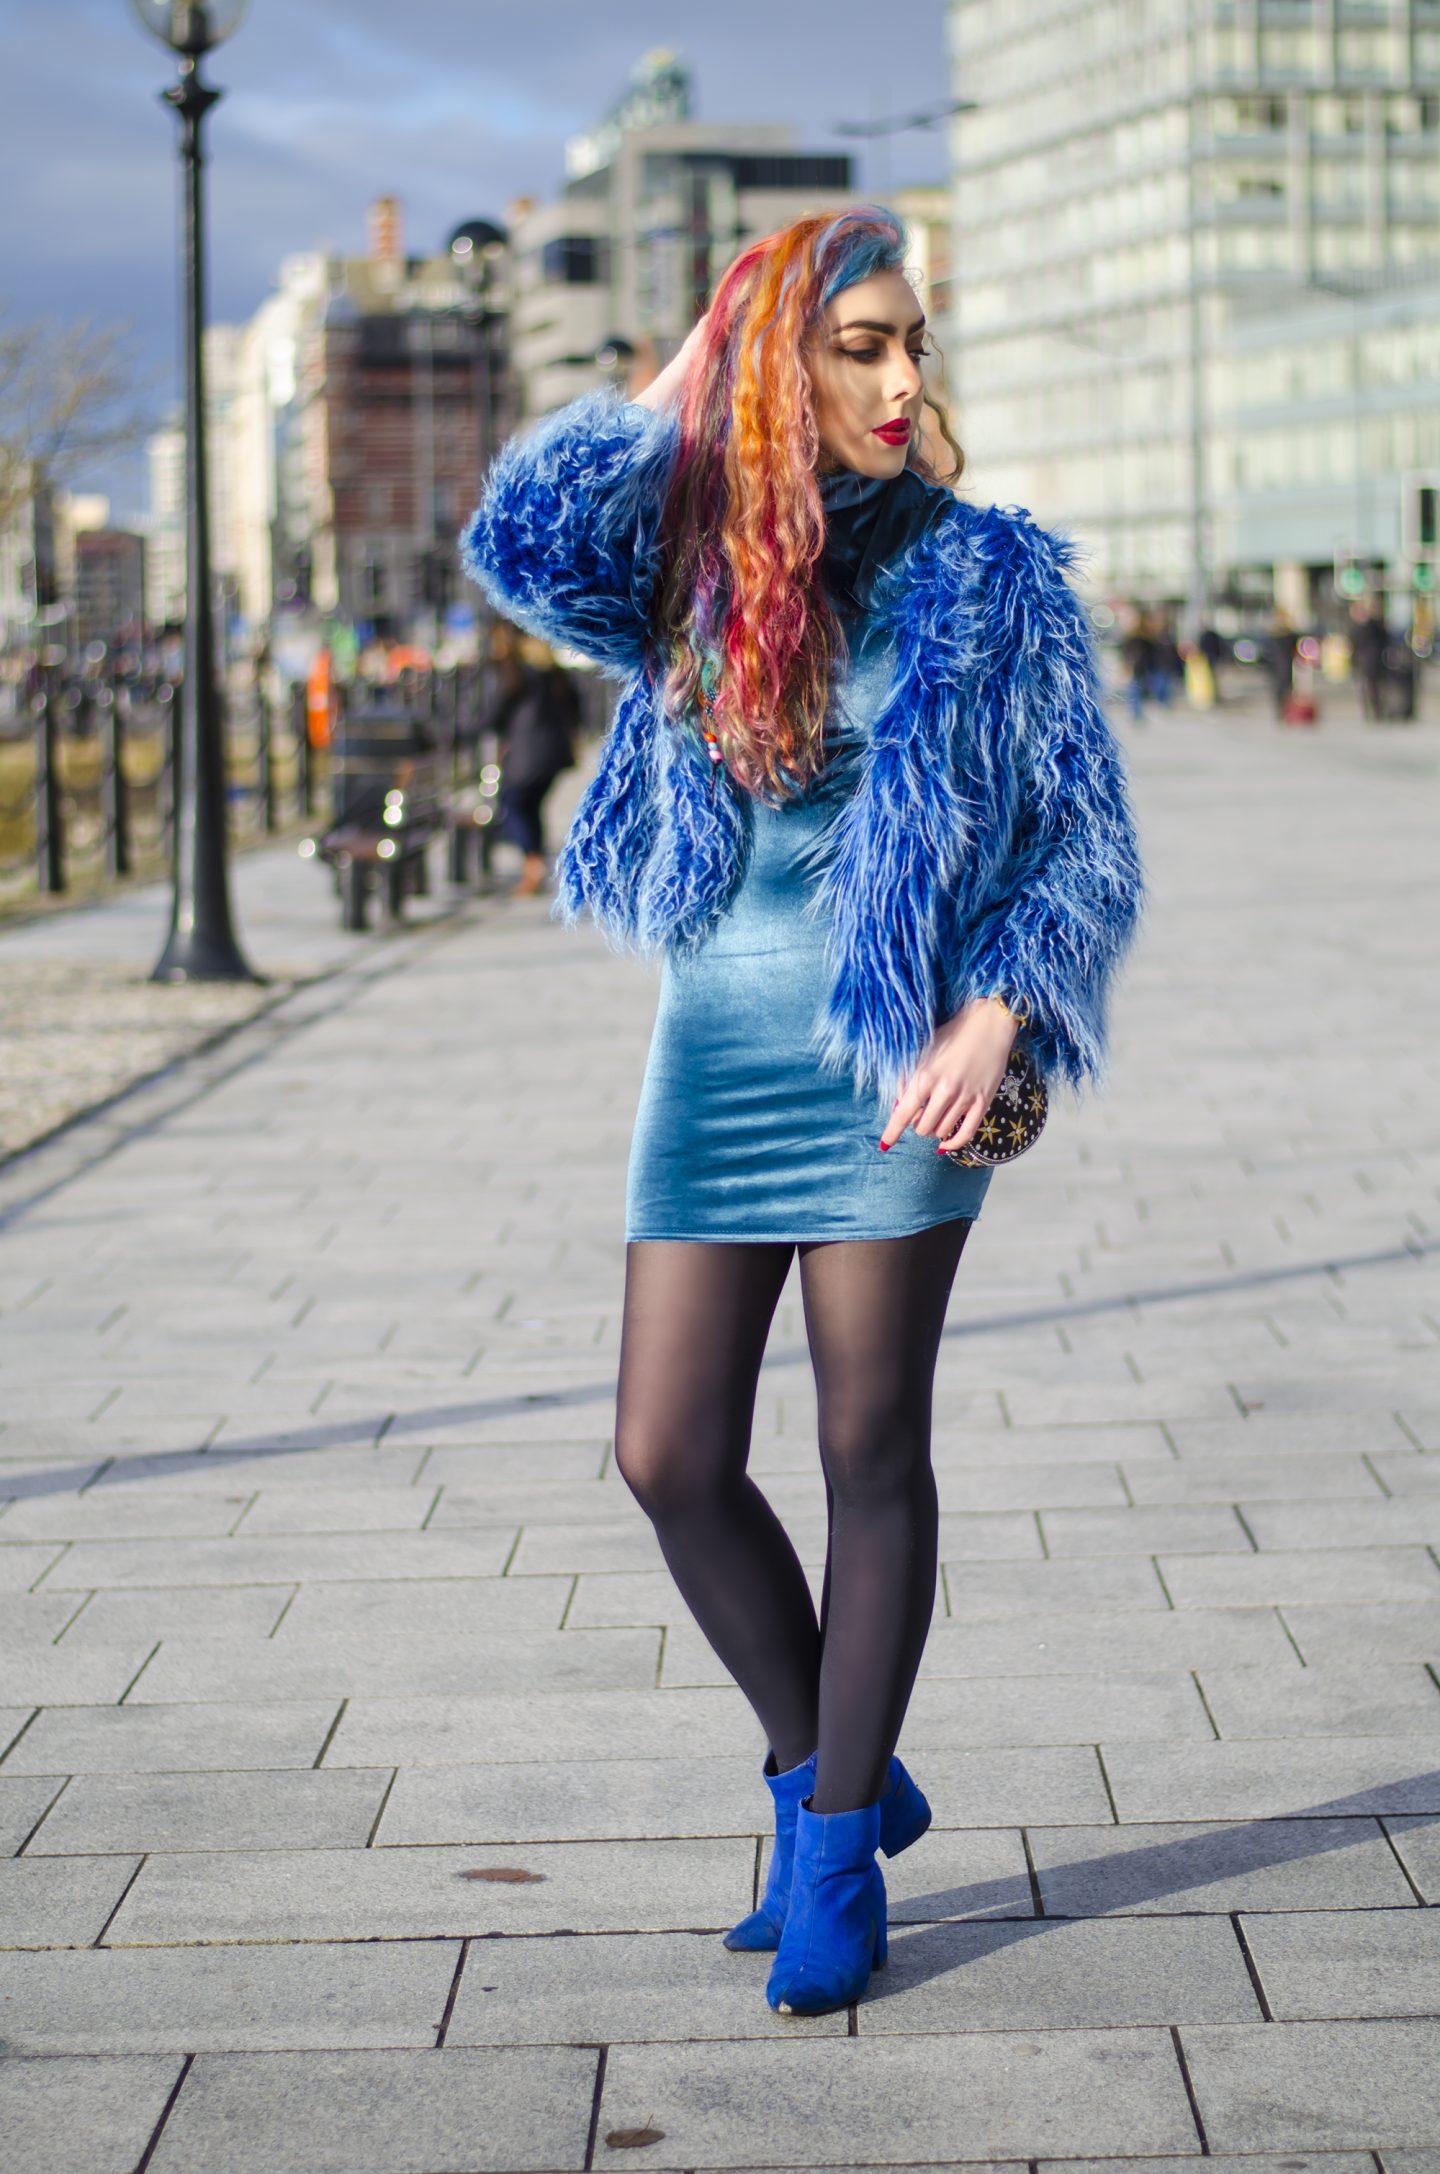 Long hair blue fur jacket from style blogger Stephi LaReine